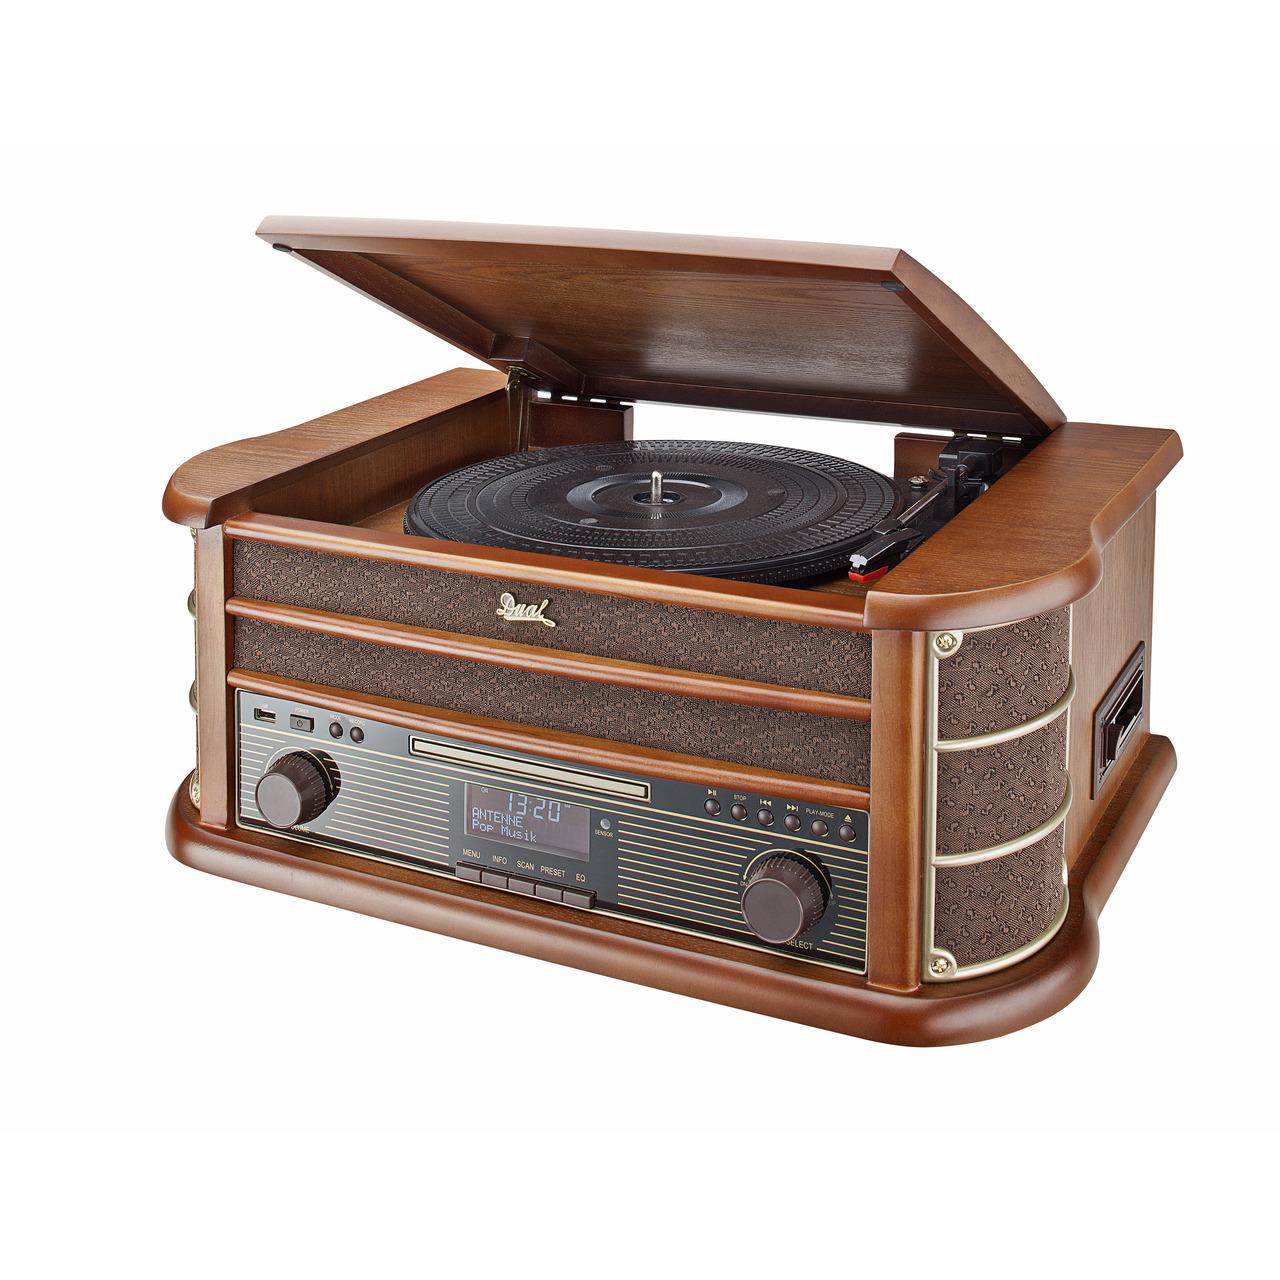 Dual Nostalgie-Stereo-Musikcenter NR 50 DAB- UKW-DAB+- USB- CD-Player- Kassettenlaufwerk